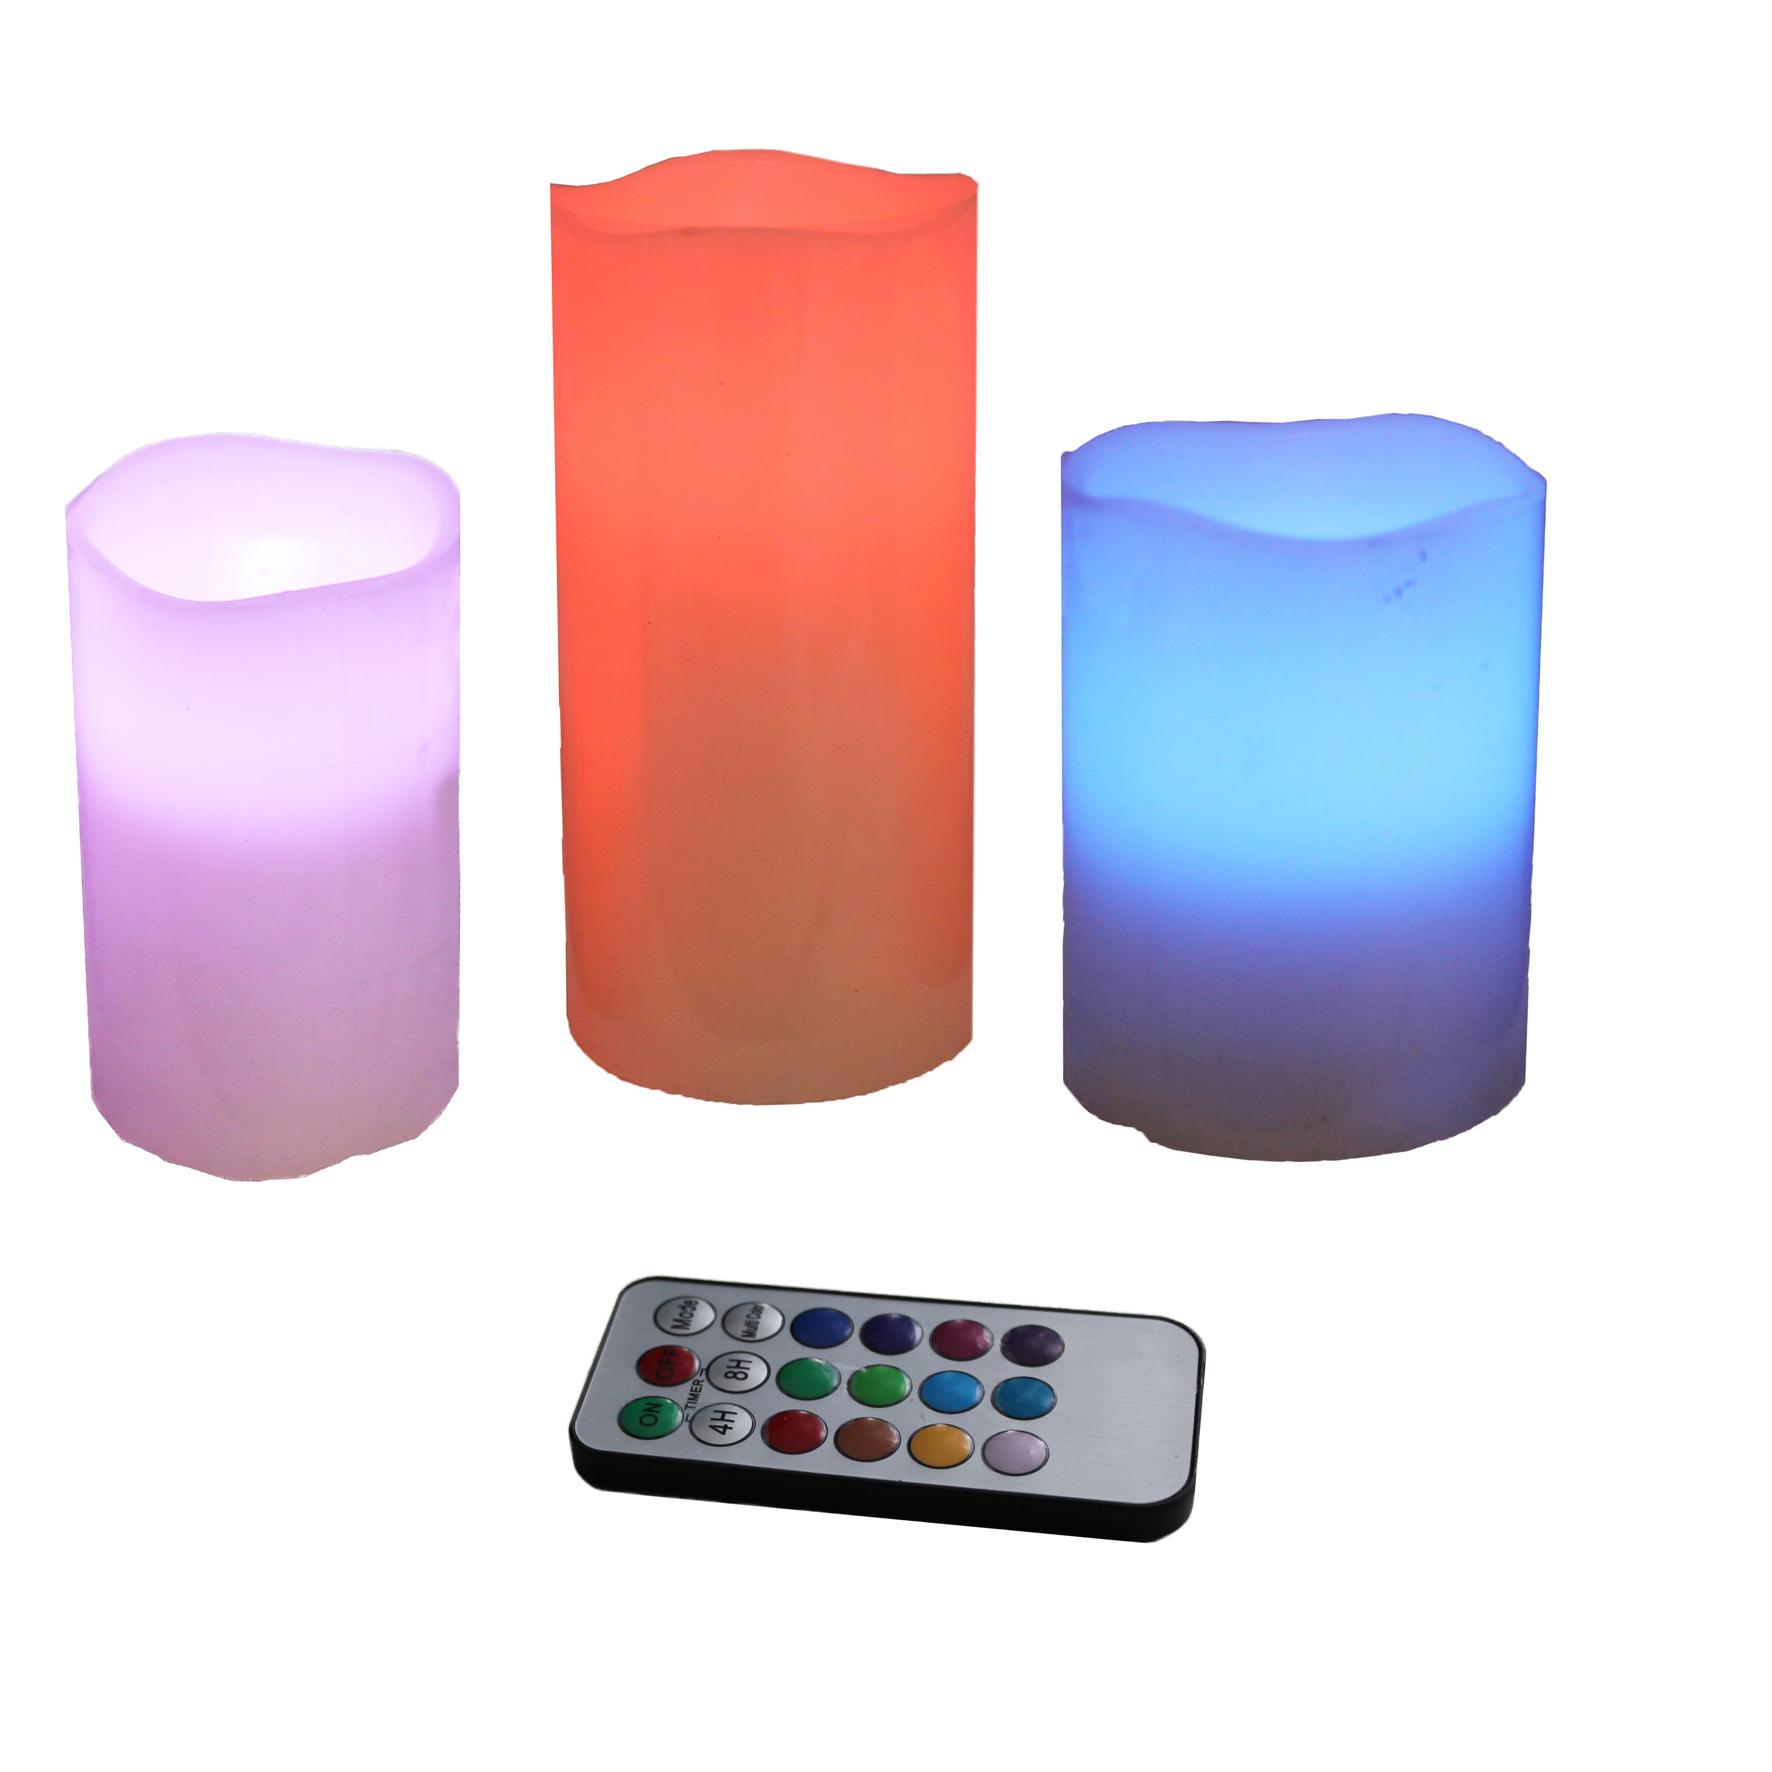 3 led kerzen kerze fernbedienung timer farbwechsel licht flammenlos flackernd ebay. Black Bedroom Furniture Sets. Home Design Ideas